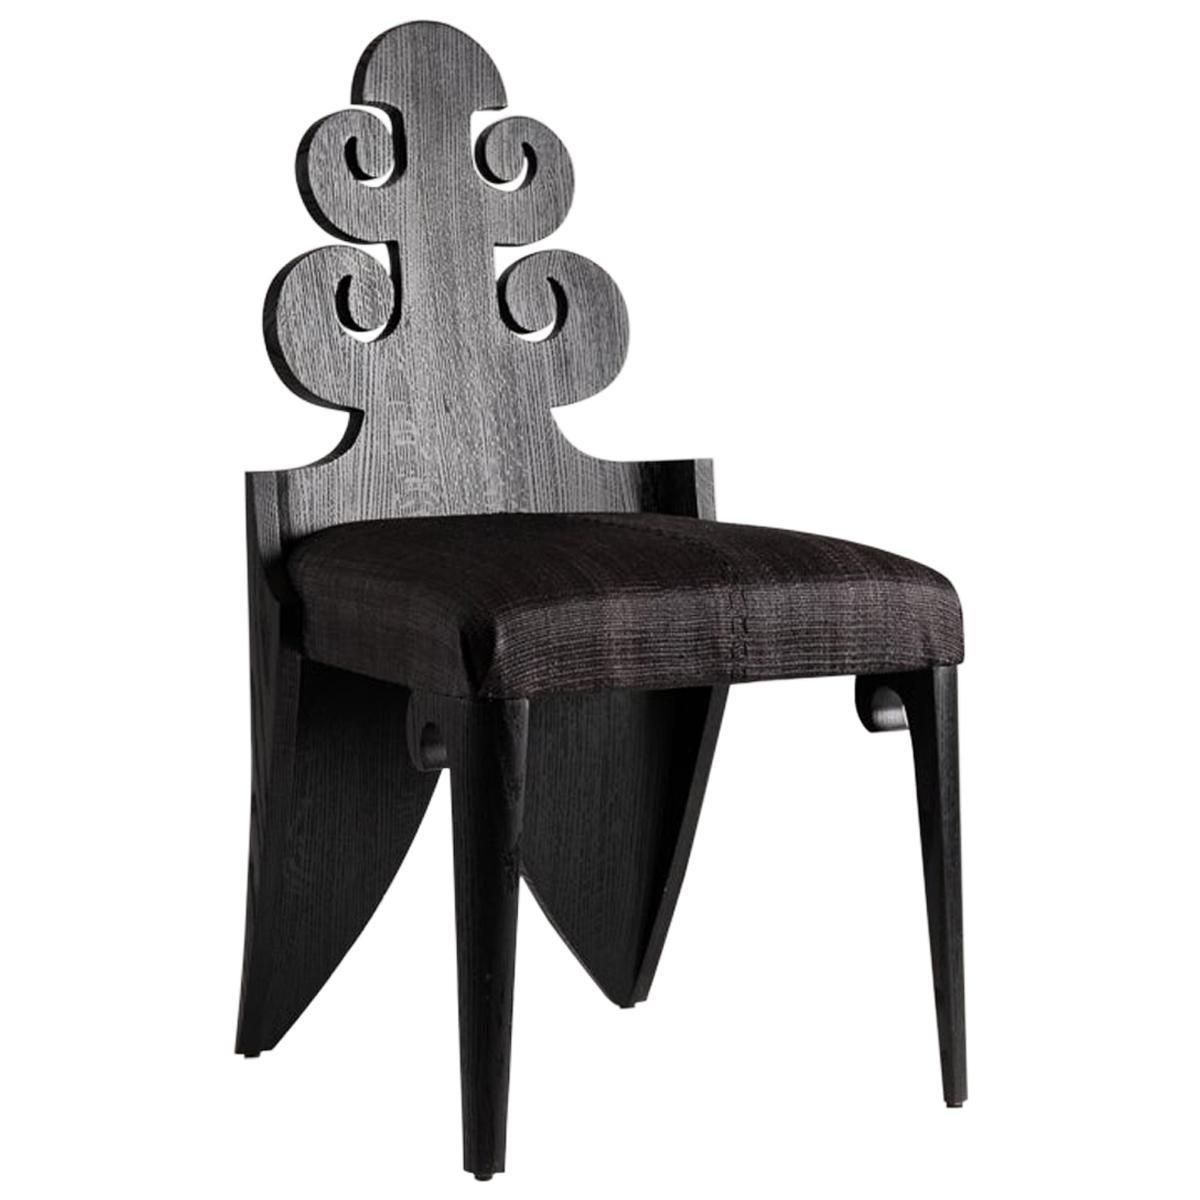 "Laura Kirar, ""Scarabe"" Contemporary Side Chair, Mexico, 2018"